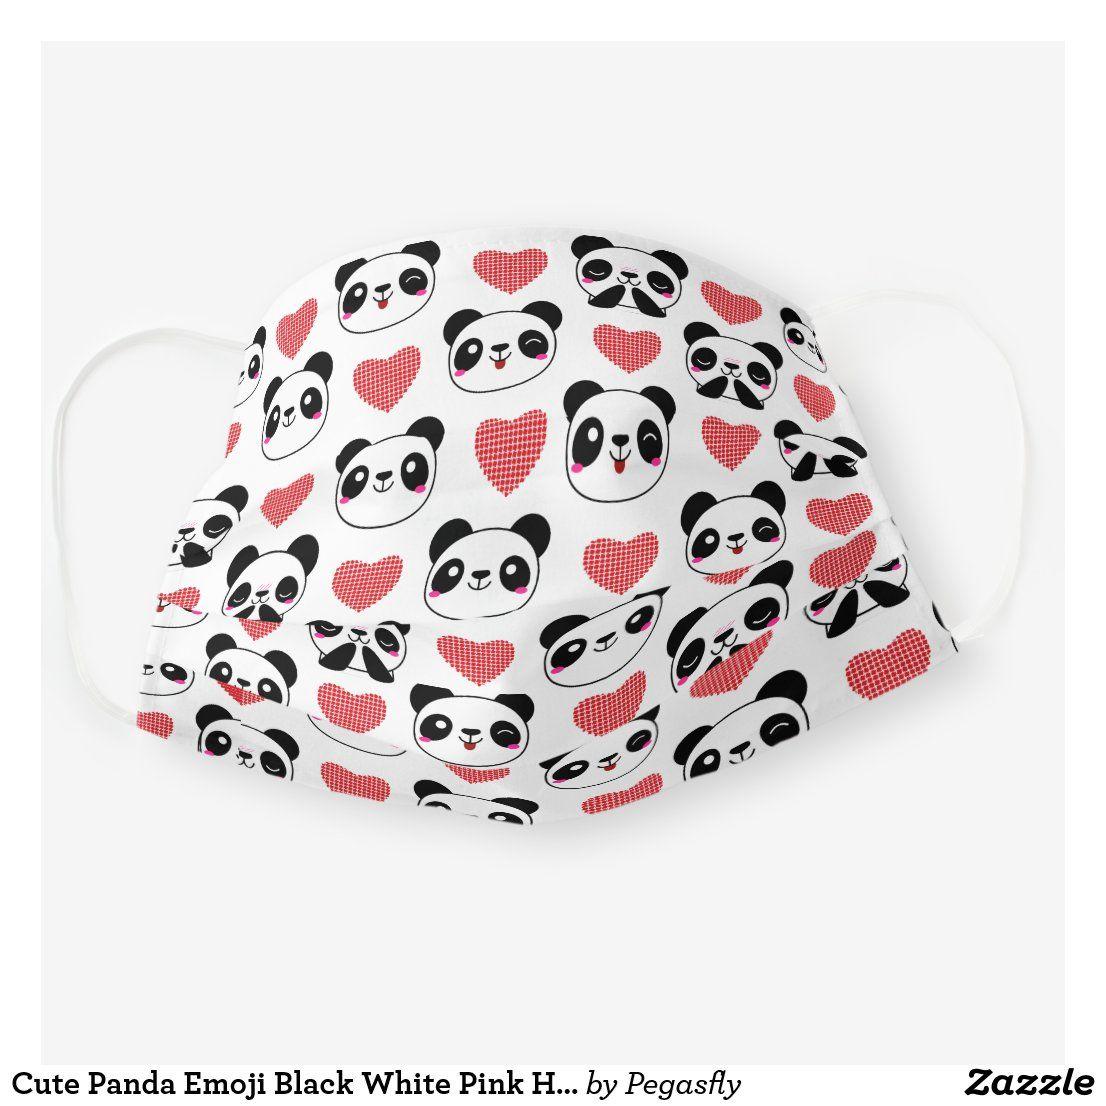 Cute Panda Emoji Black White Pink Hearts Pattern Cloth